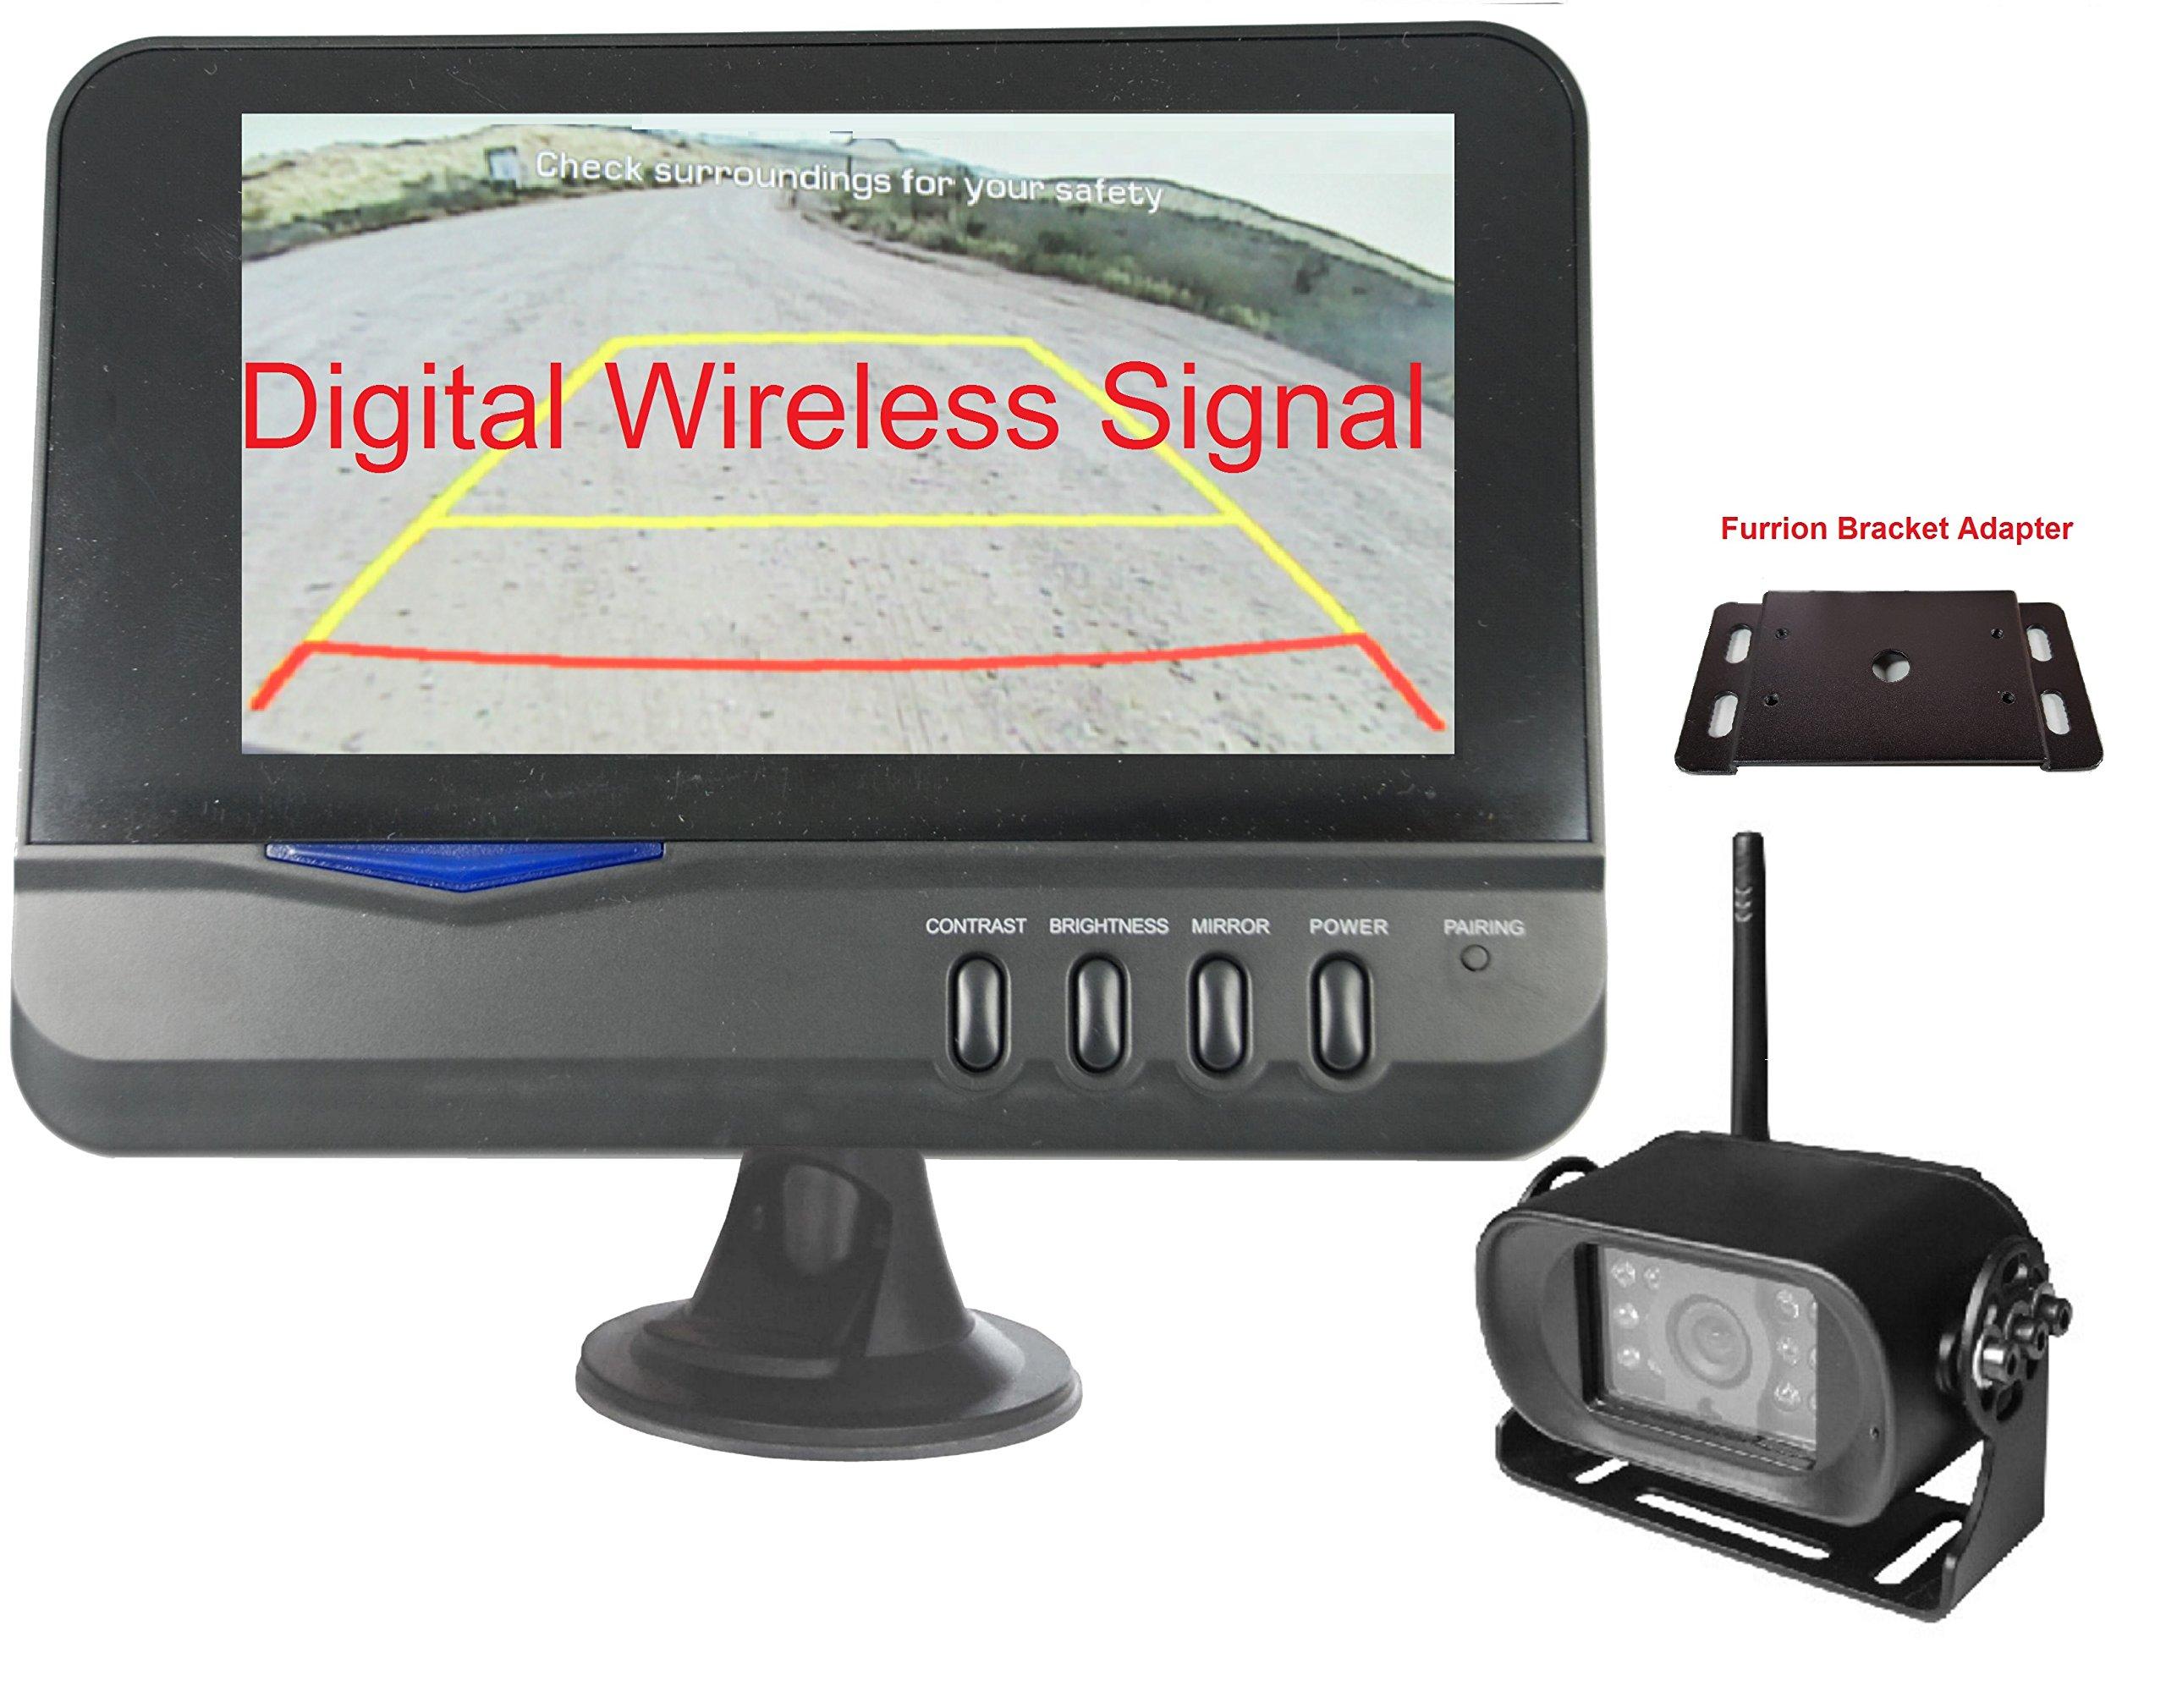 4Ucam Digital Wireless Camera + 7'' Monitor + Adapter for Furrion FRCBRKT-BL Pre-install Mounting Kit (FOS48T-BL/FOC12TA-BL) for RV, Trailer, 5th Wheels